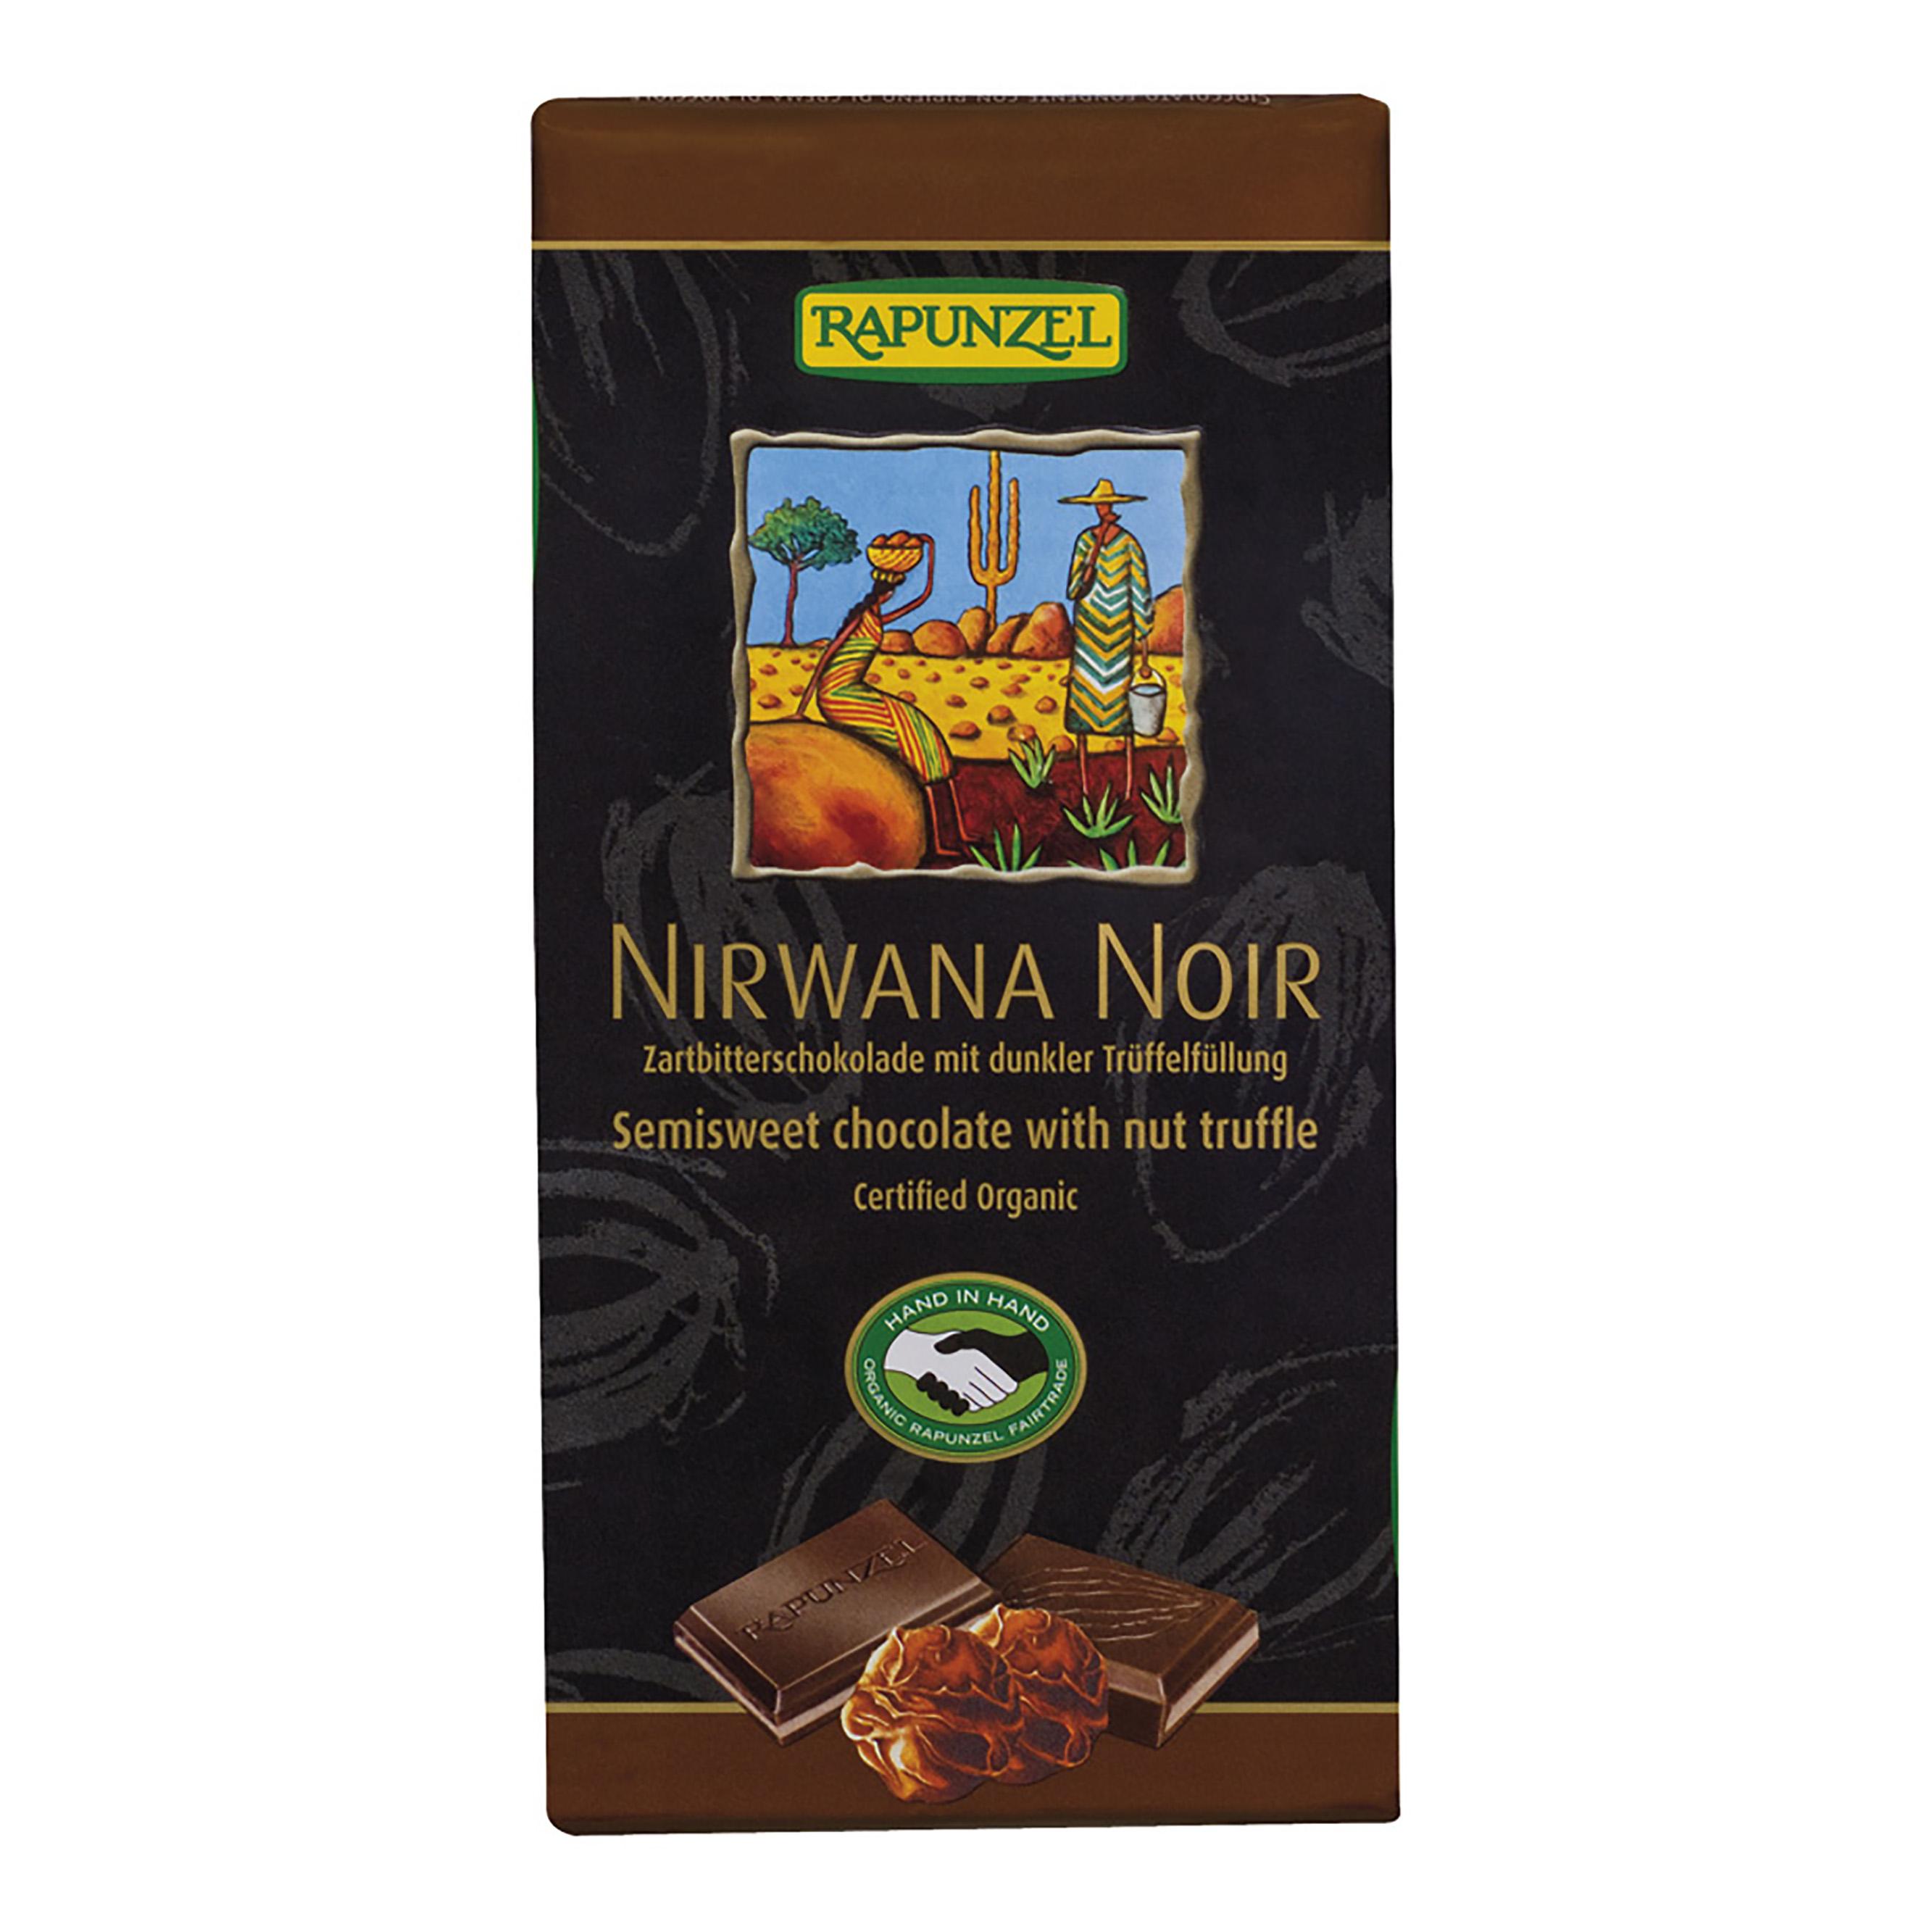 Rapunzel Čokoláda Nirwana hořká BIO 100 g Rapunzel* 100g